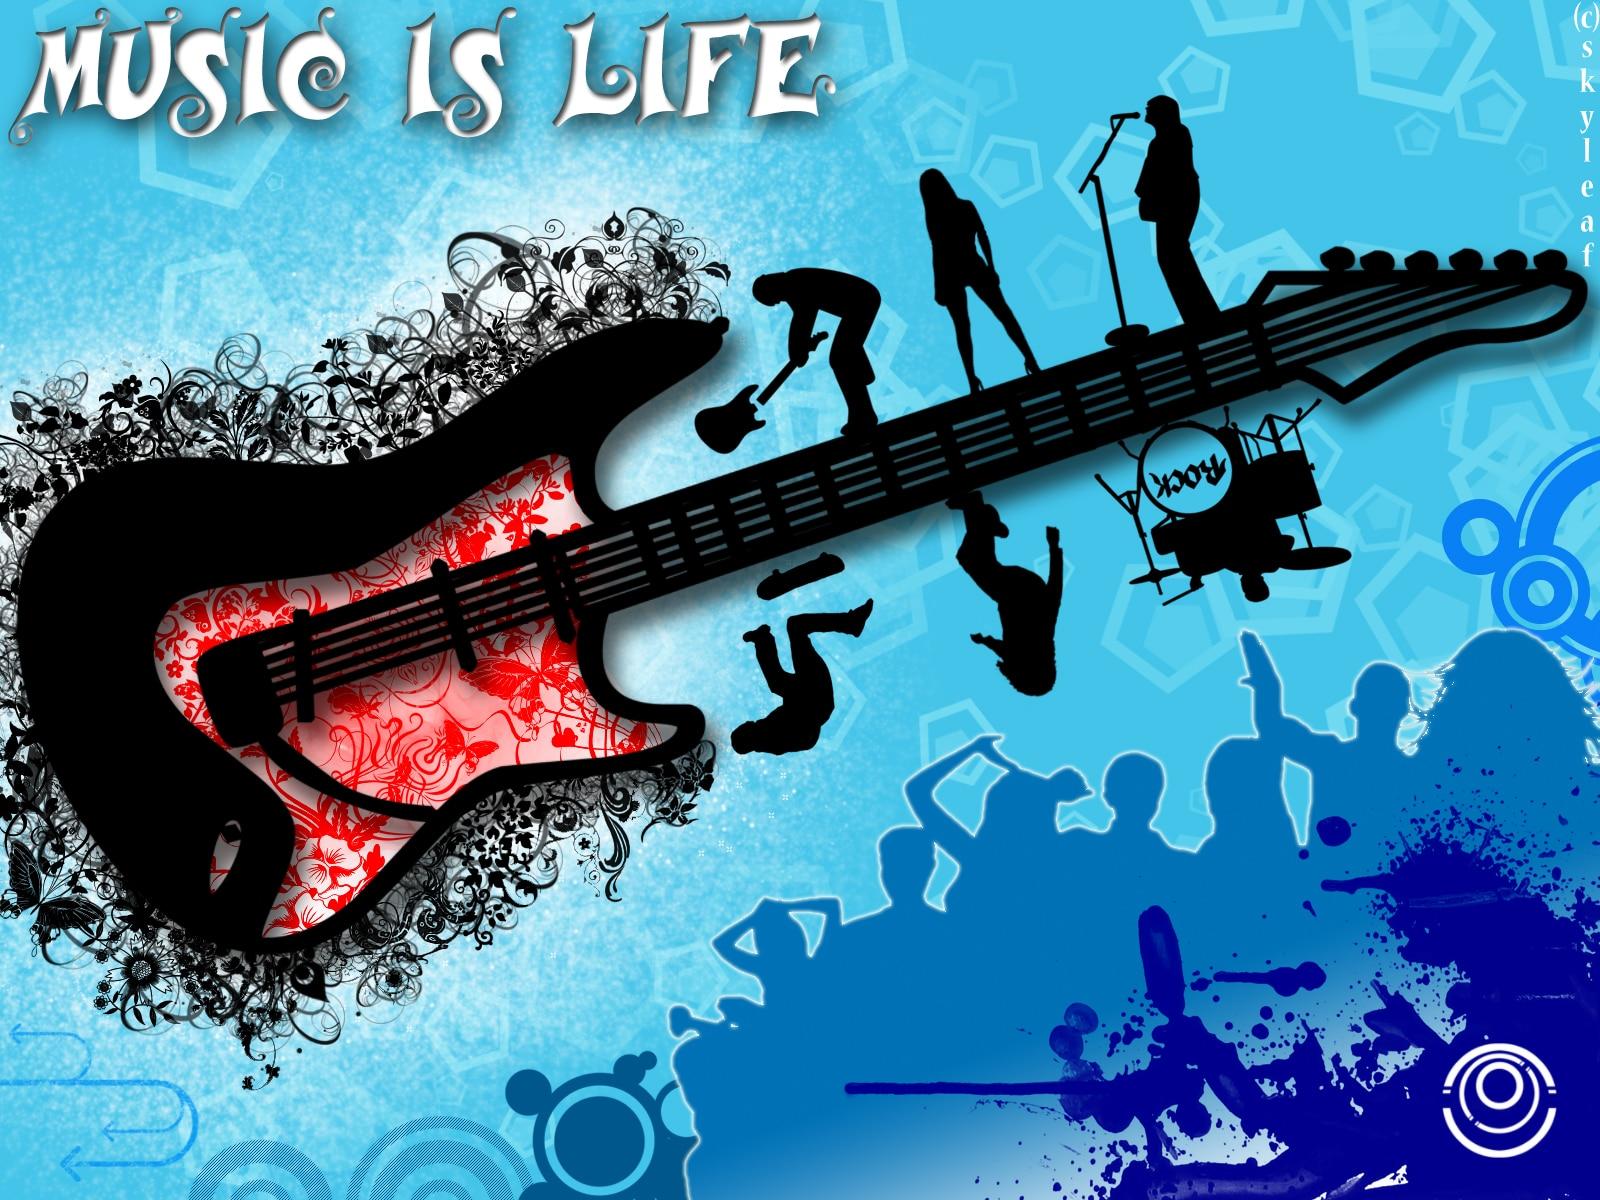 www.infinetmusicworld.com